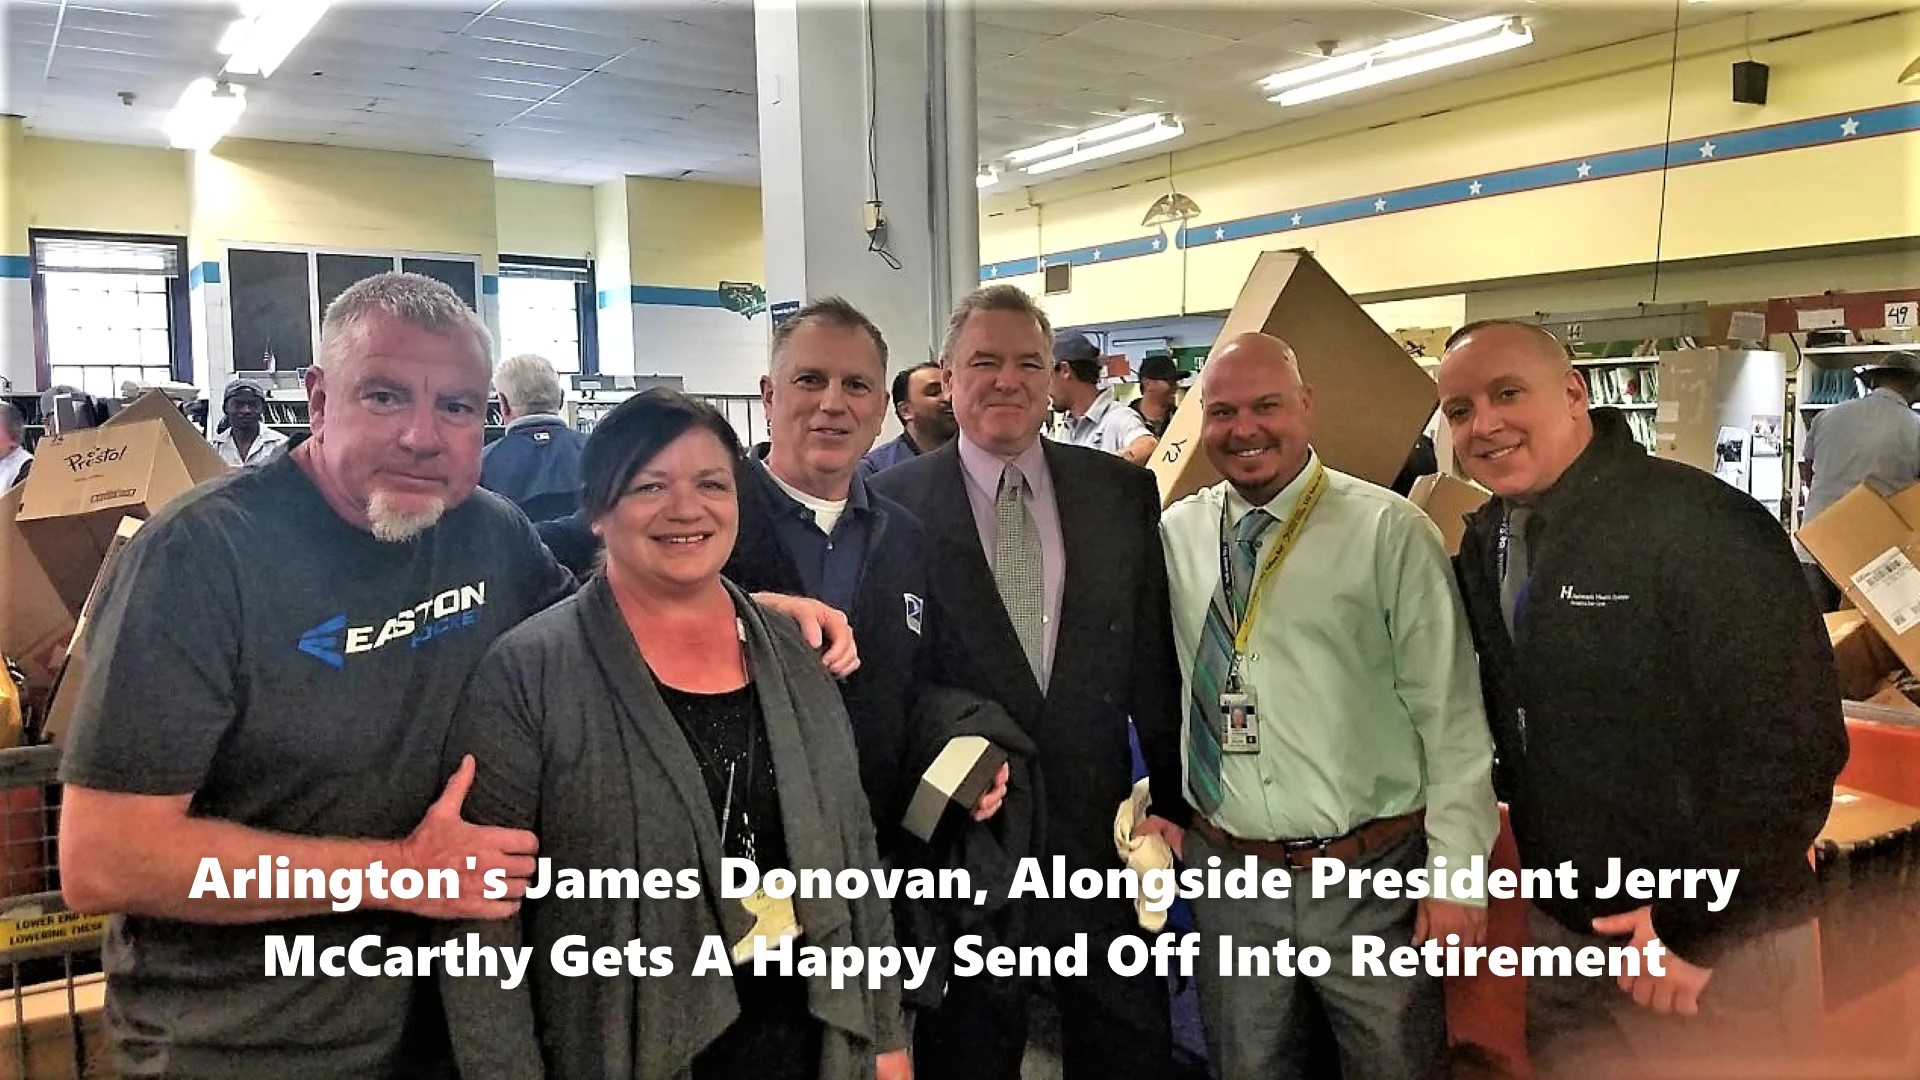 62019James-Donovan-retirement-Arlington-1_Large_Moment2